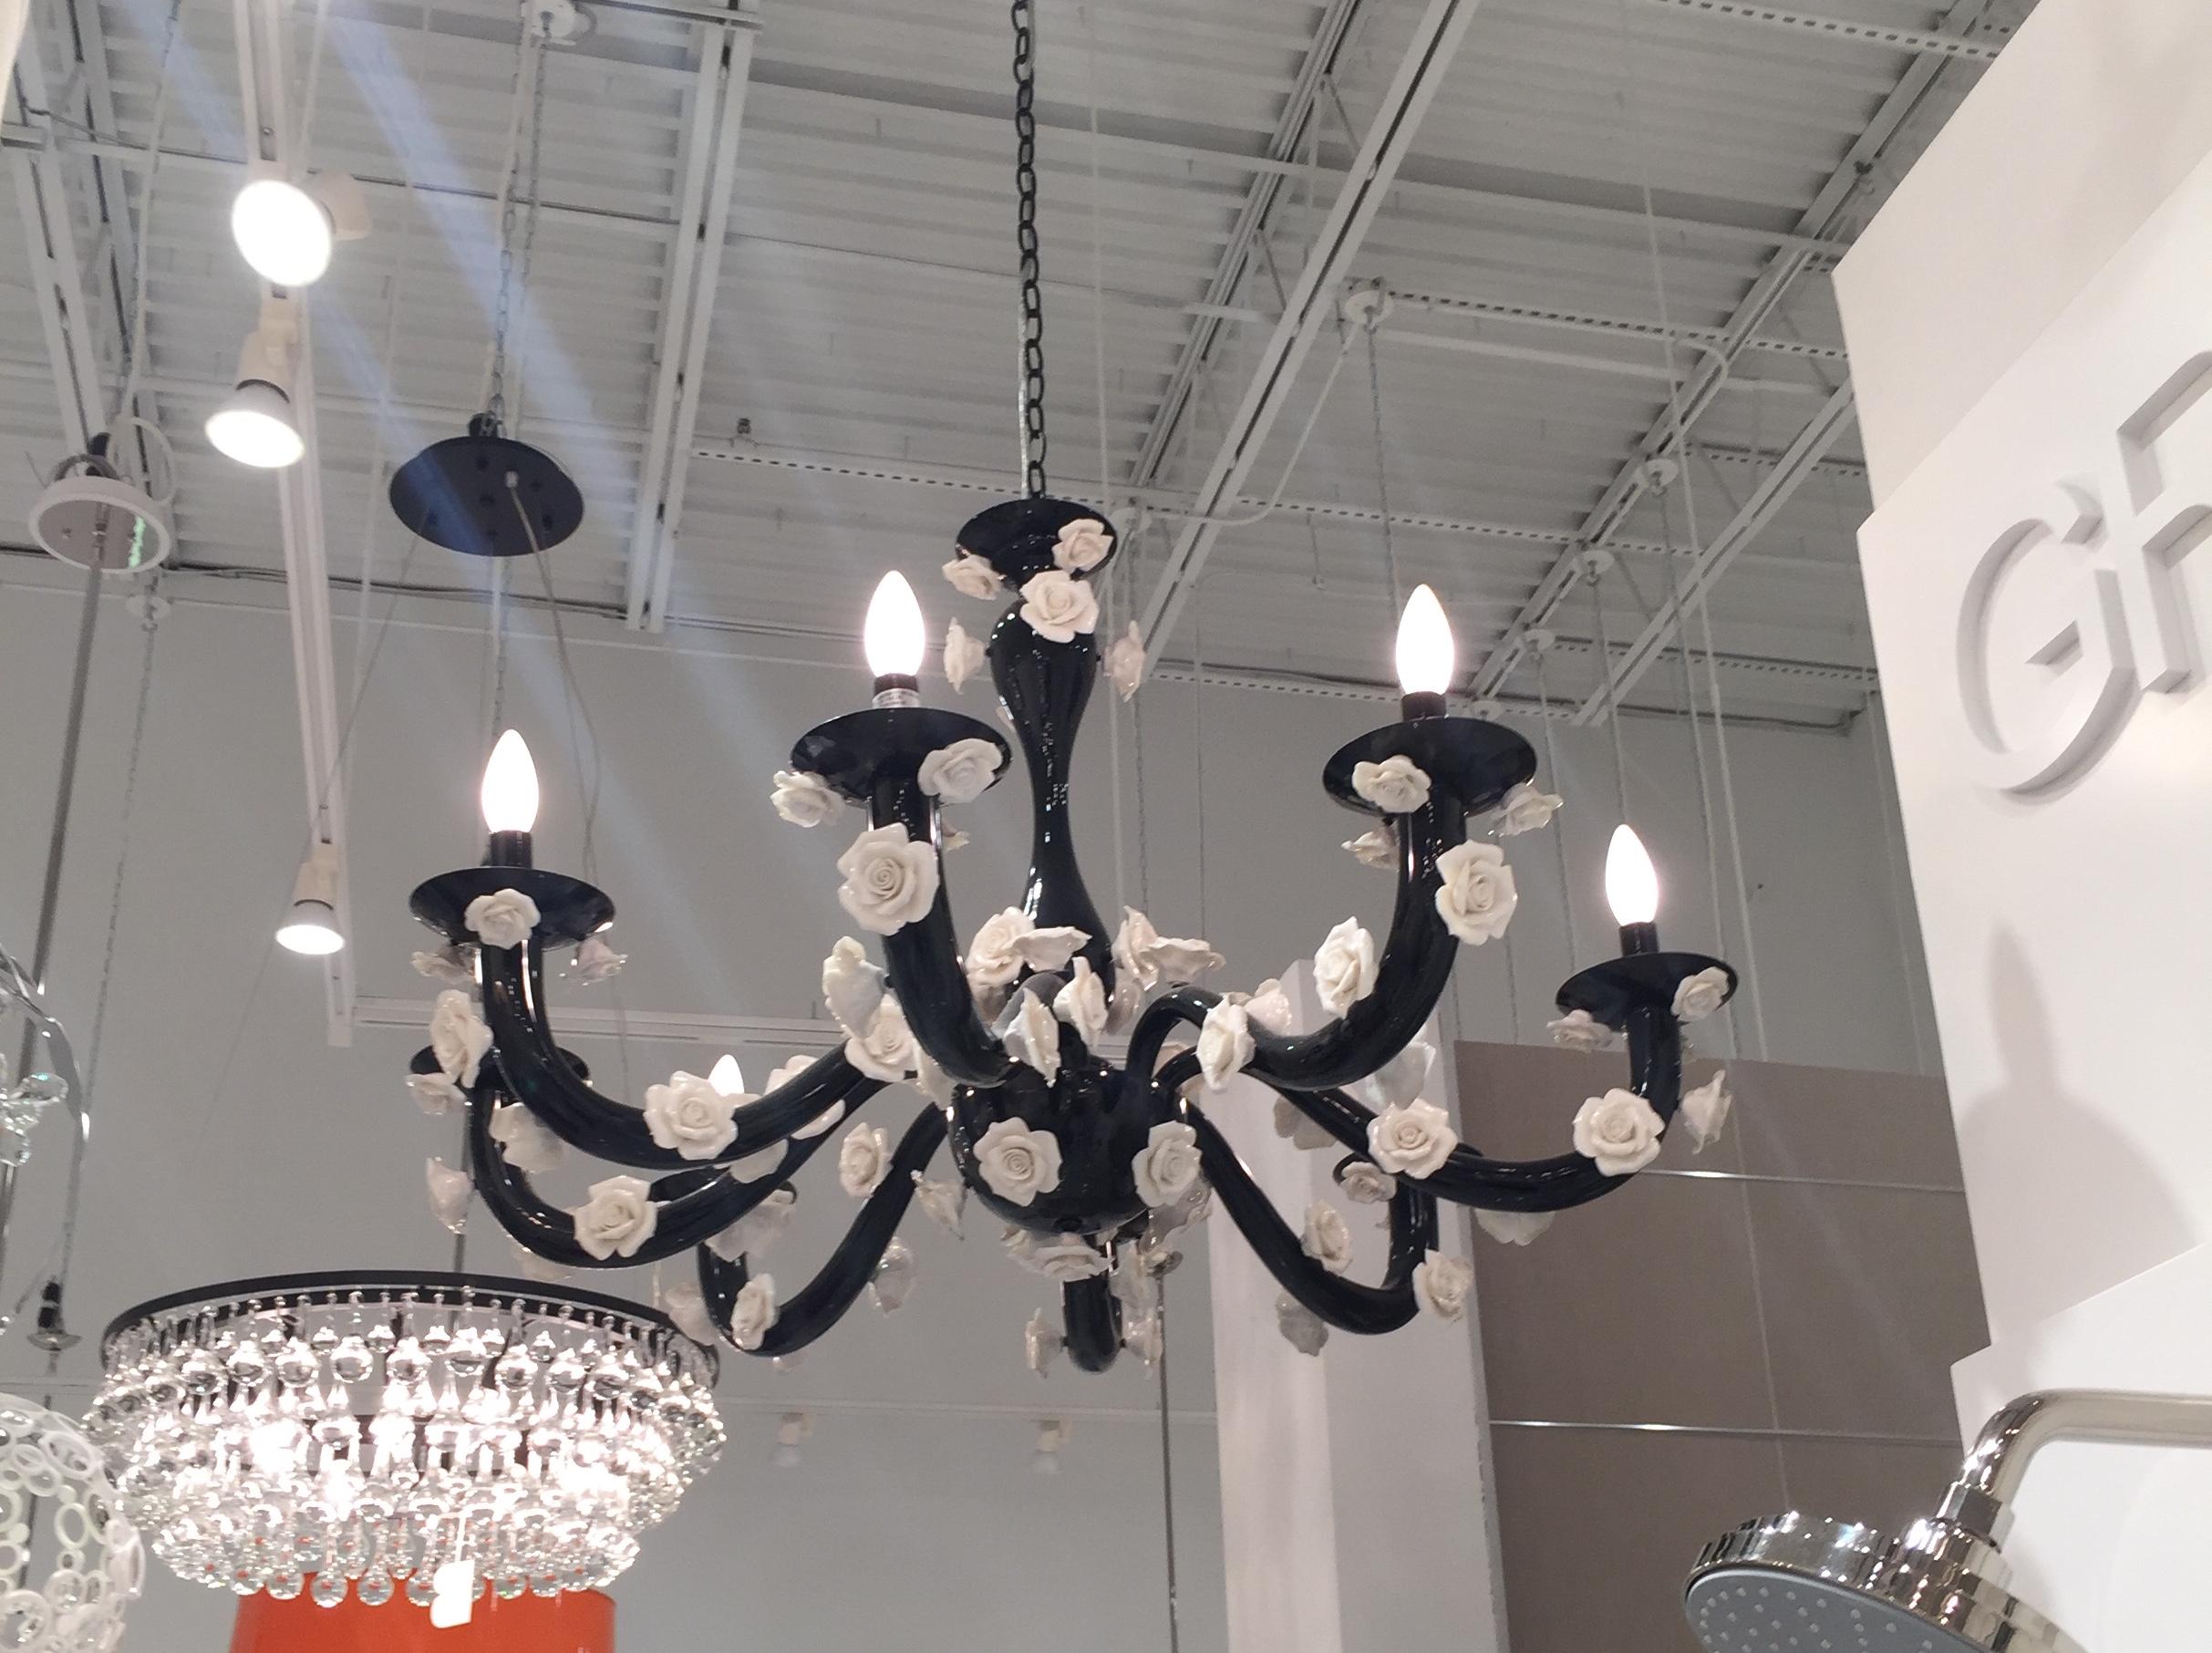 Appliqué-like details on a chandelier.